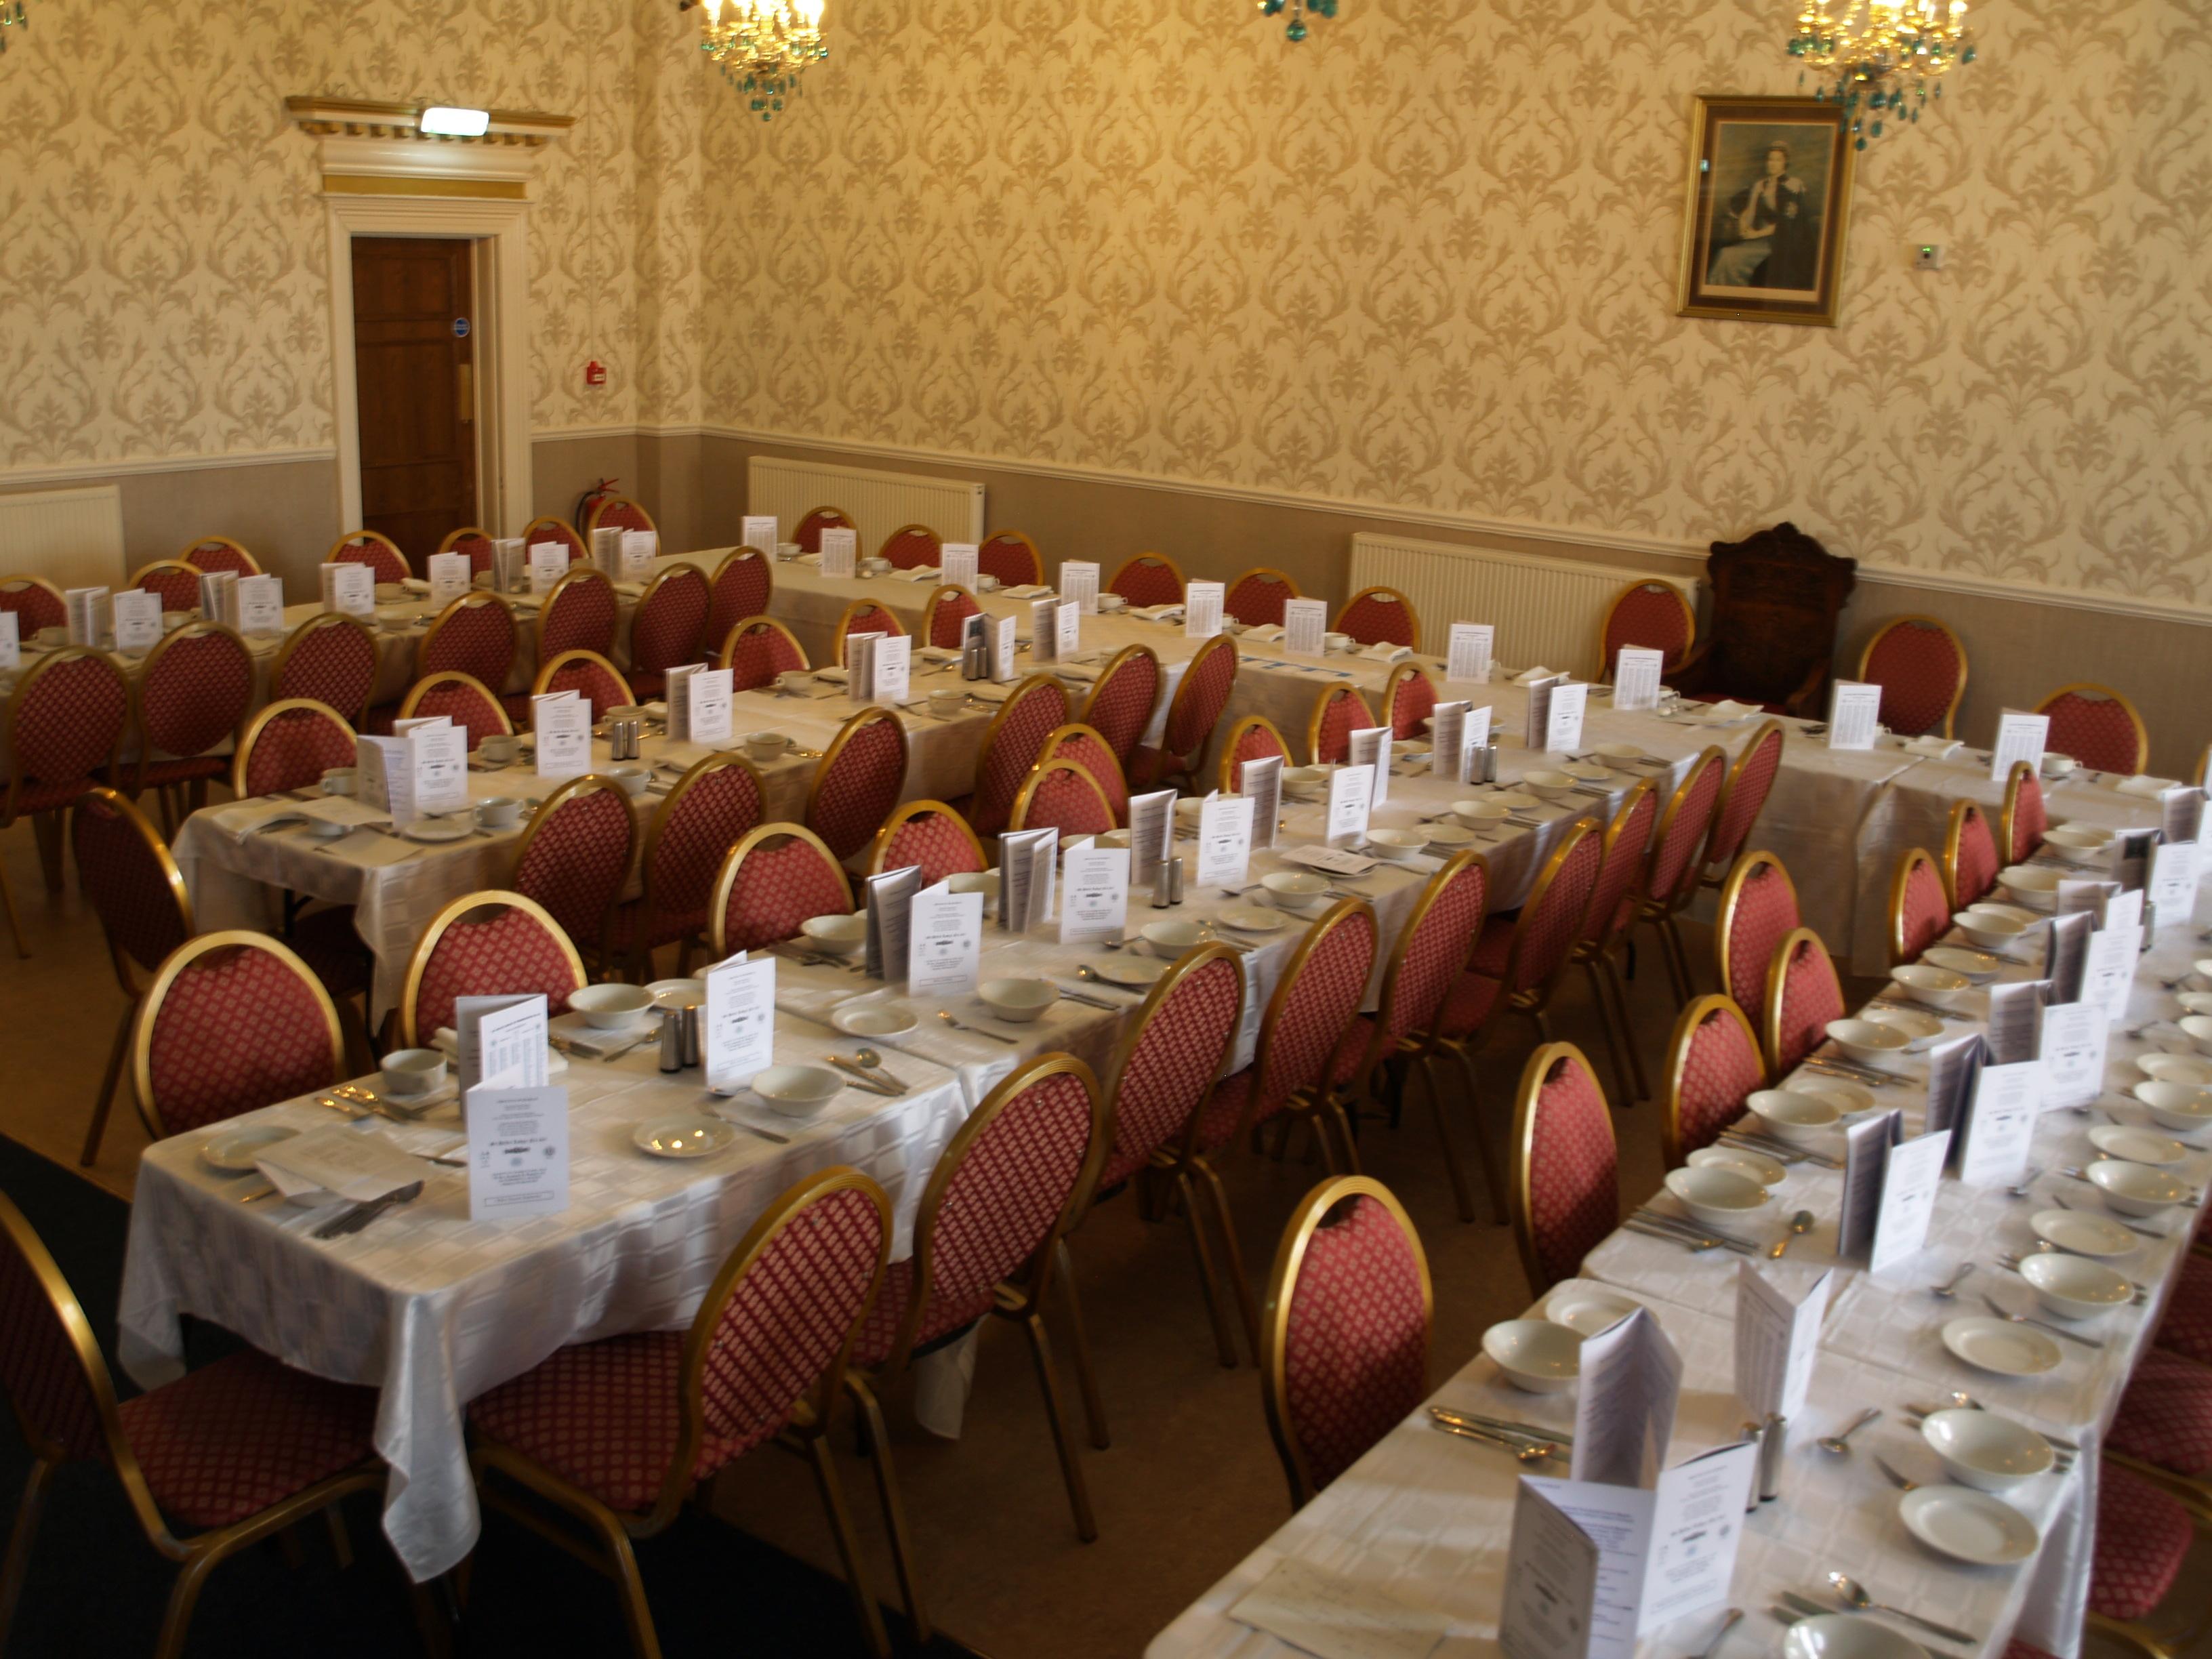 South Shields Masonic Hall 3